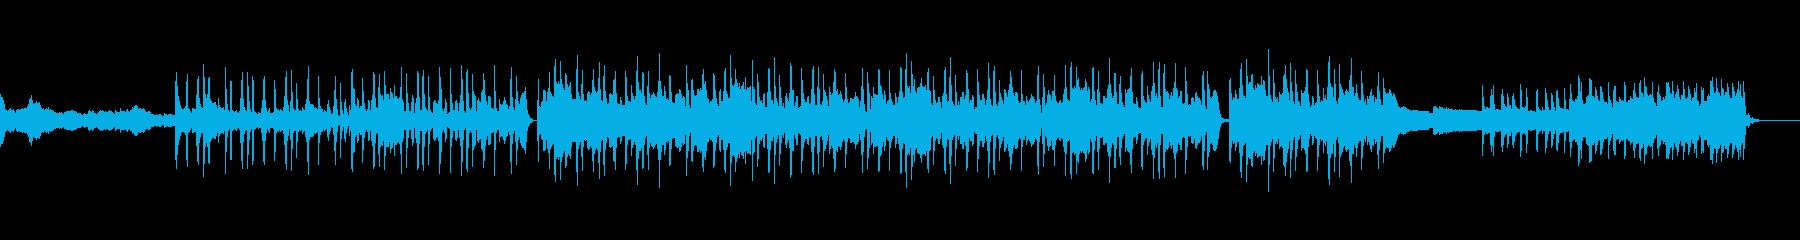 【Lofi hiphop】深夜勉強集中の再生済みの波形